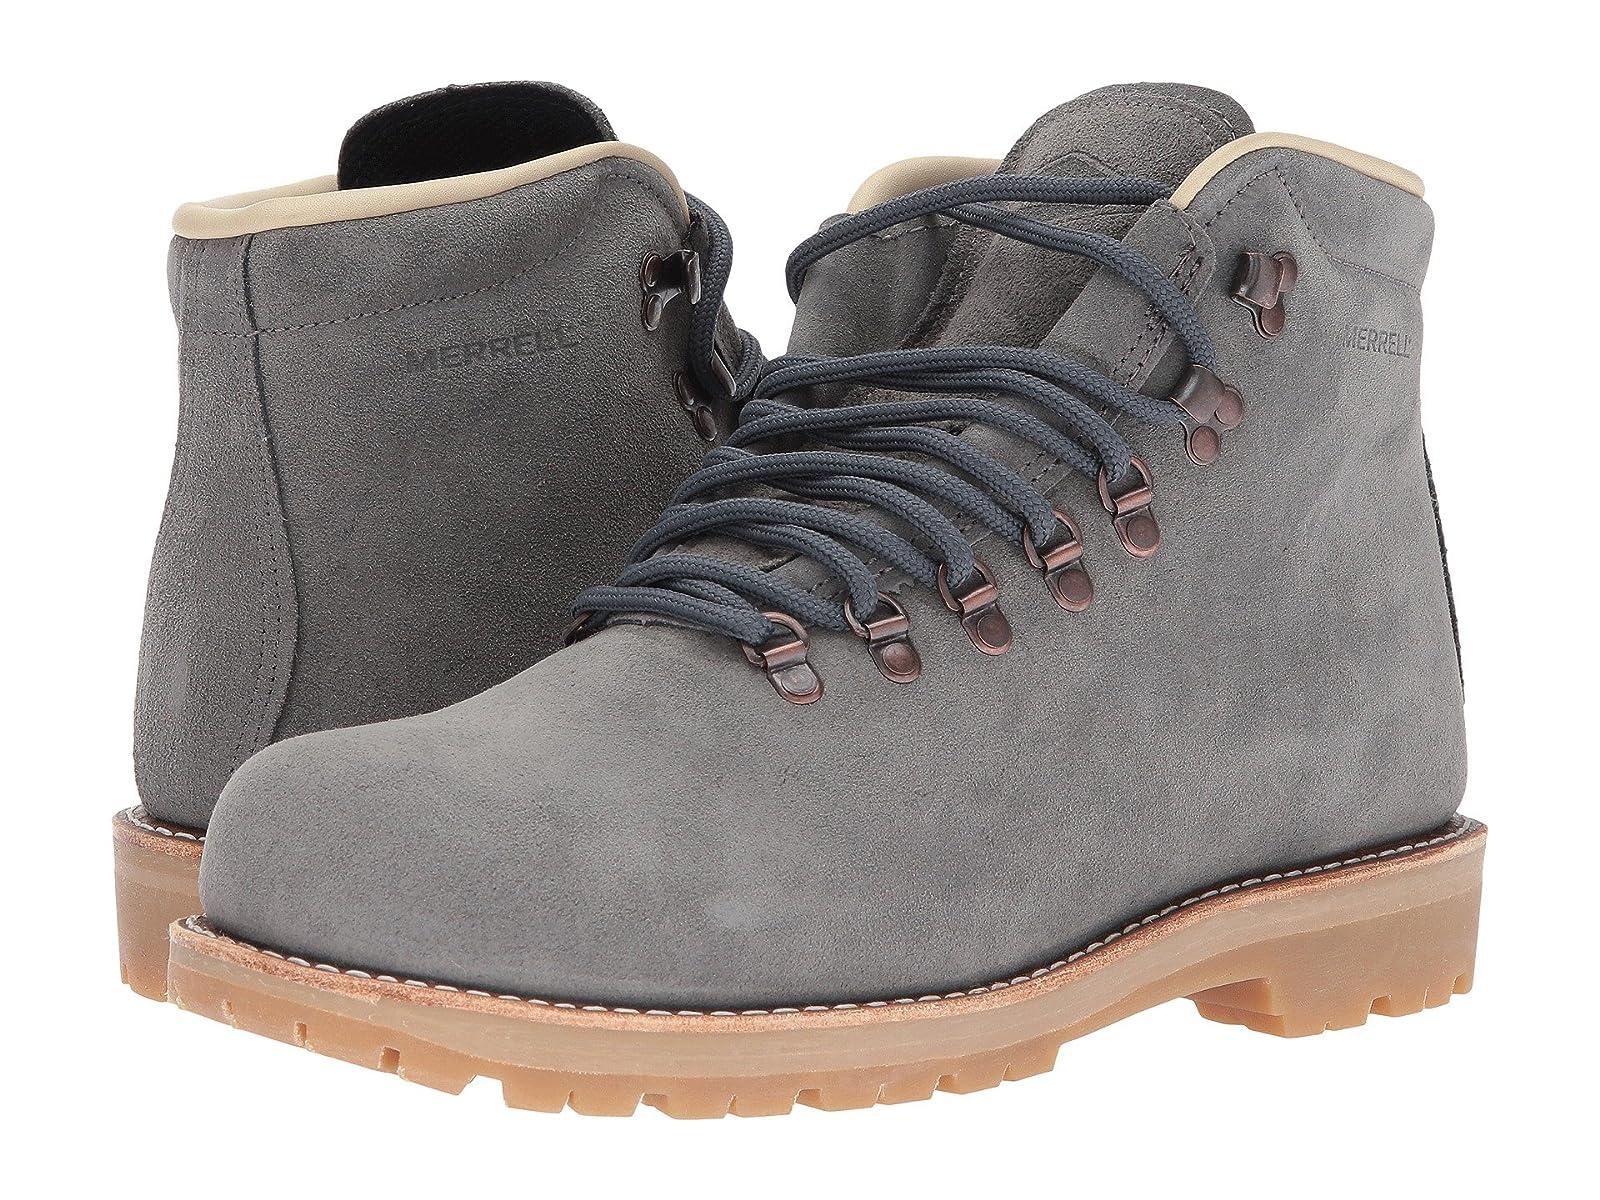 Merrell Wilderness USA SuedeCheap and distinctive eye-catching shoes